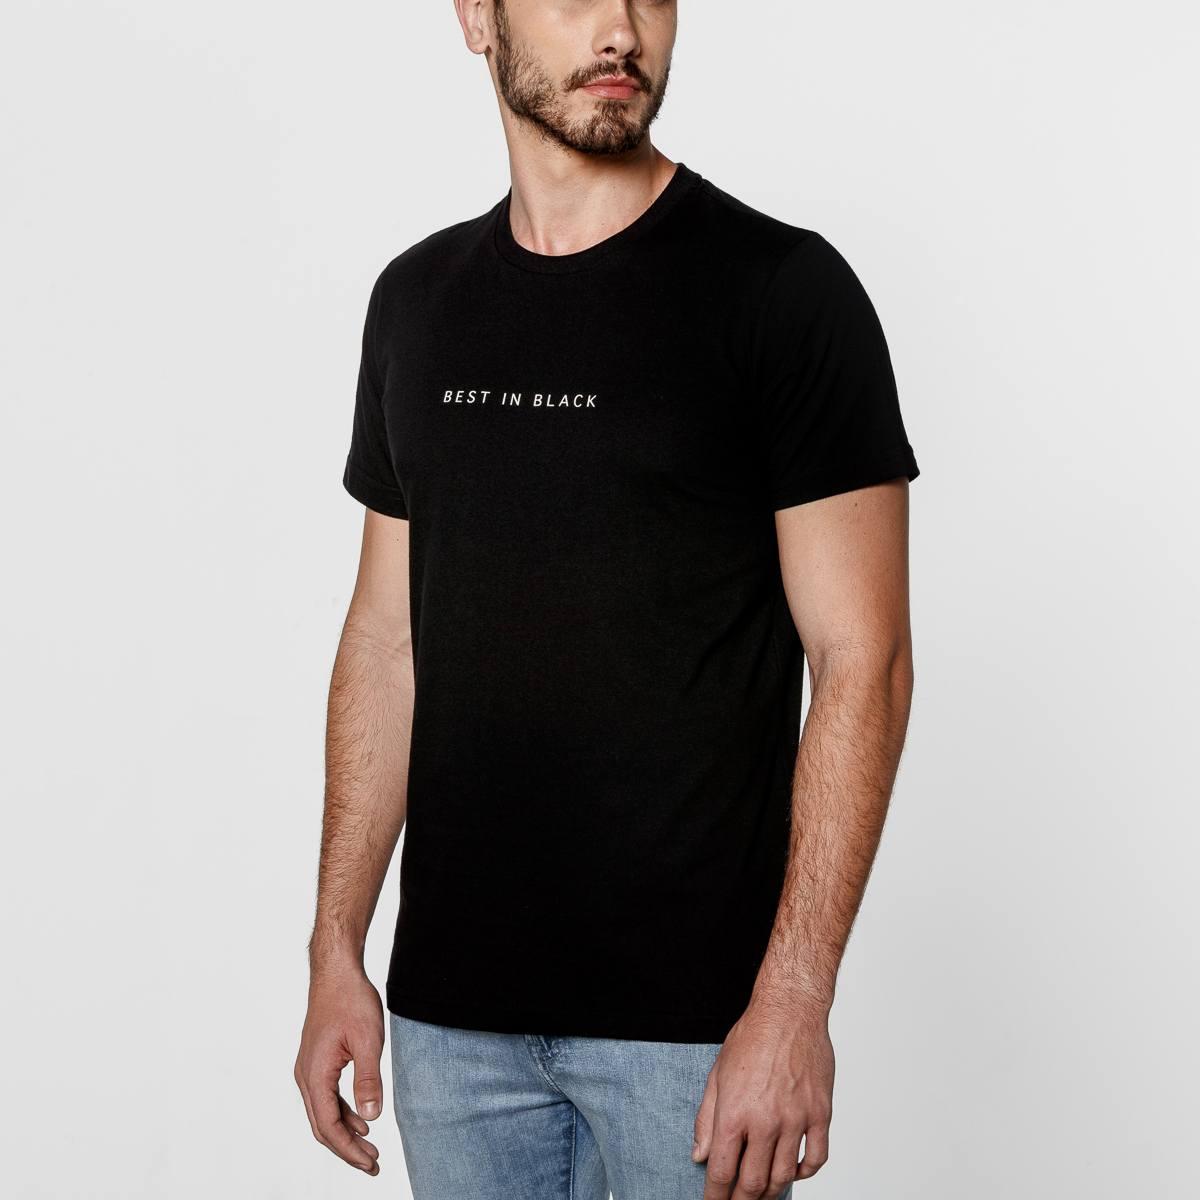 Camiseta Tresano Best in Black Slim Fit